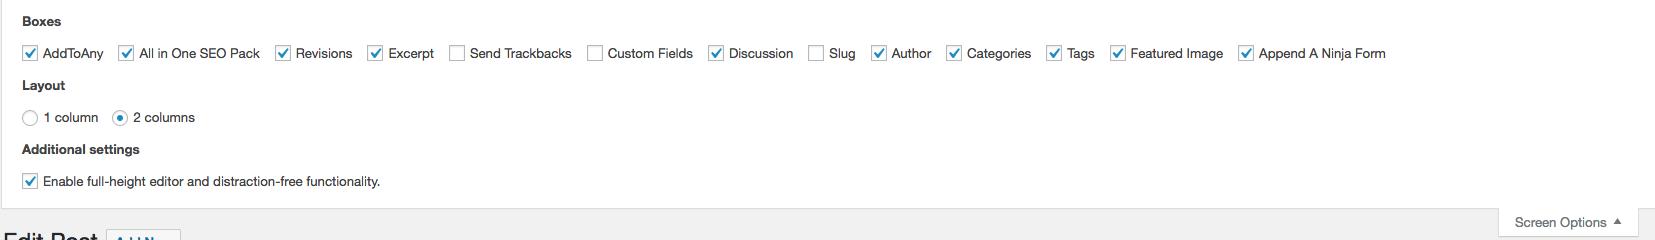 Screen options bar in WordPress